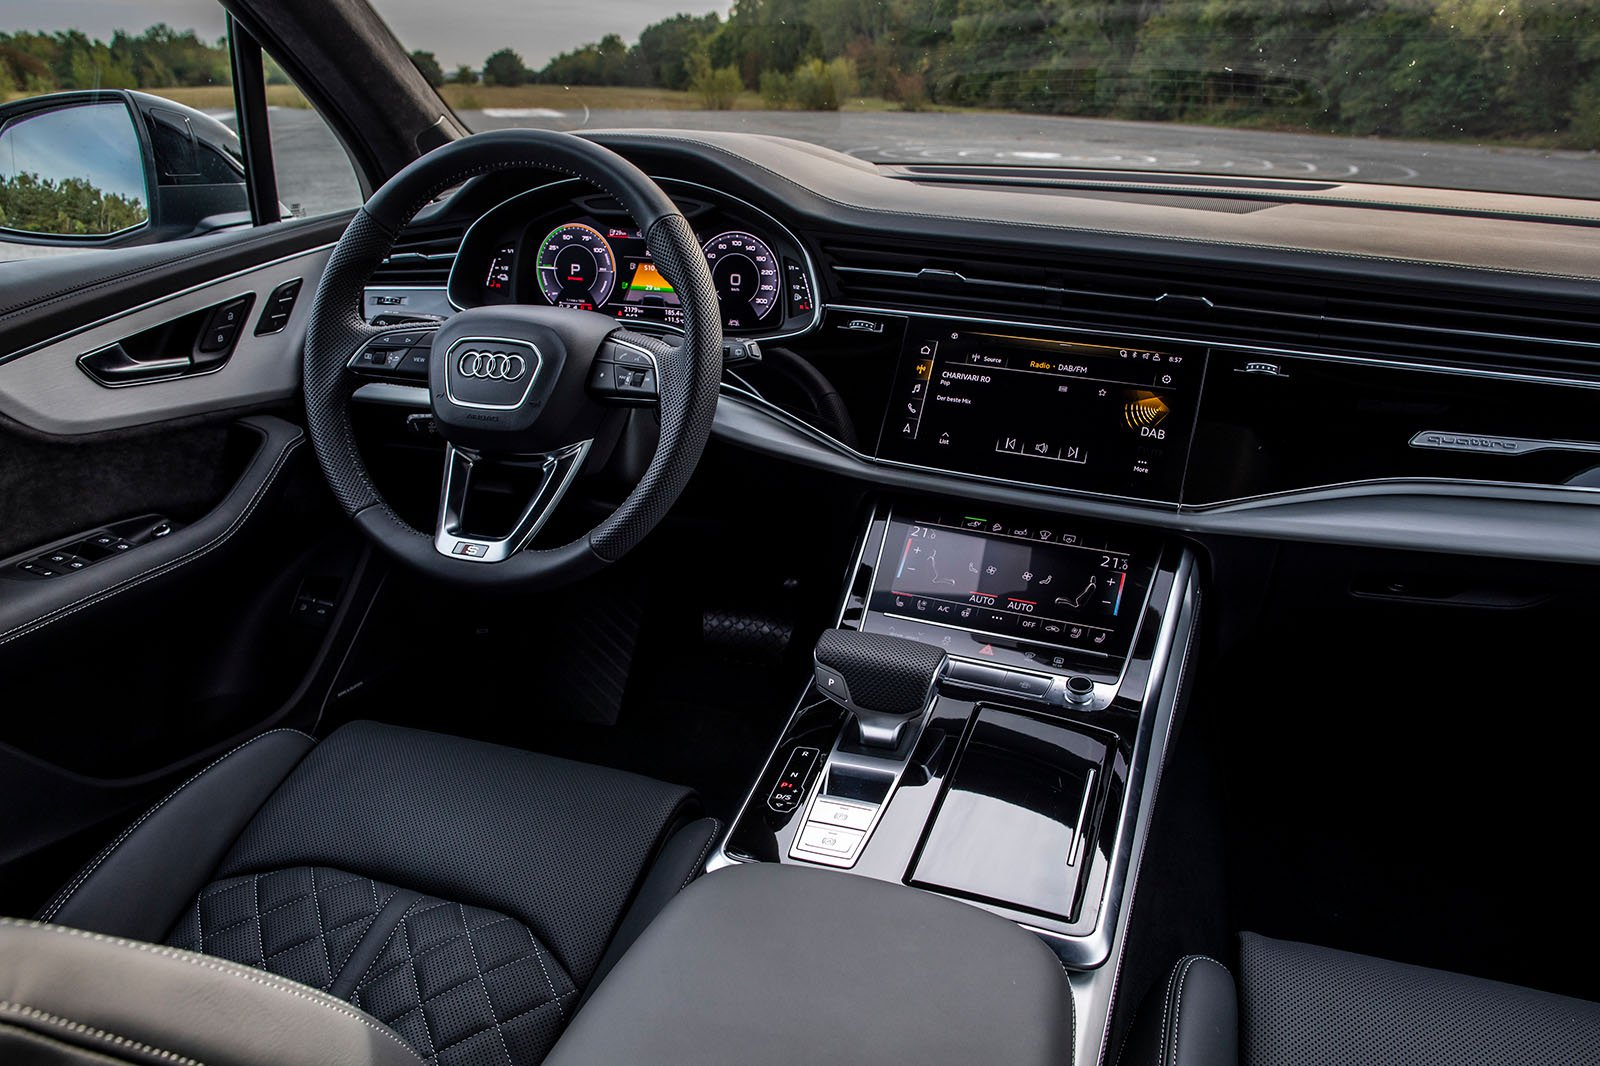 2020 Audi Q7 60 TFSIe interior